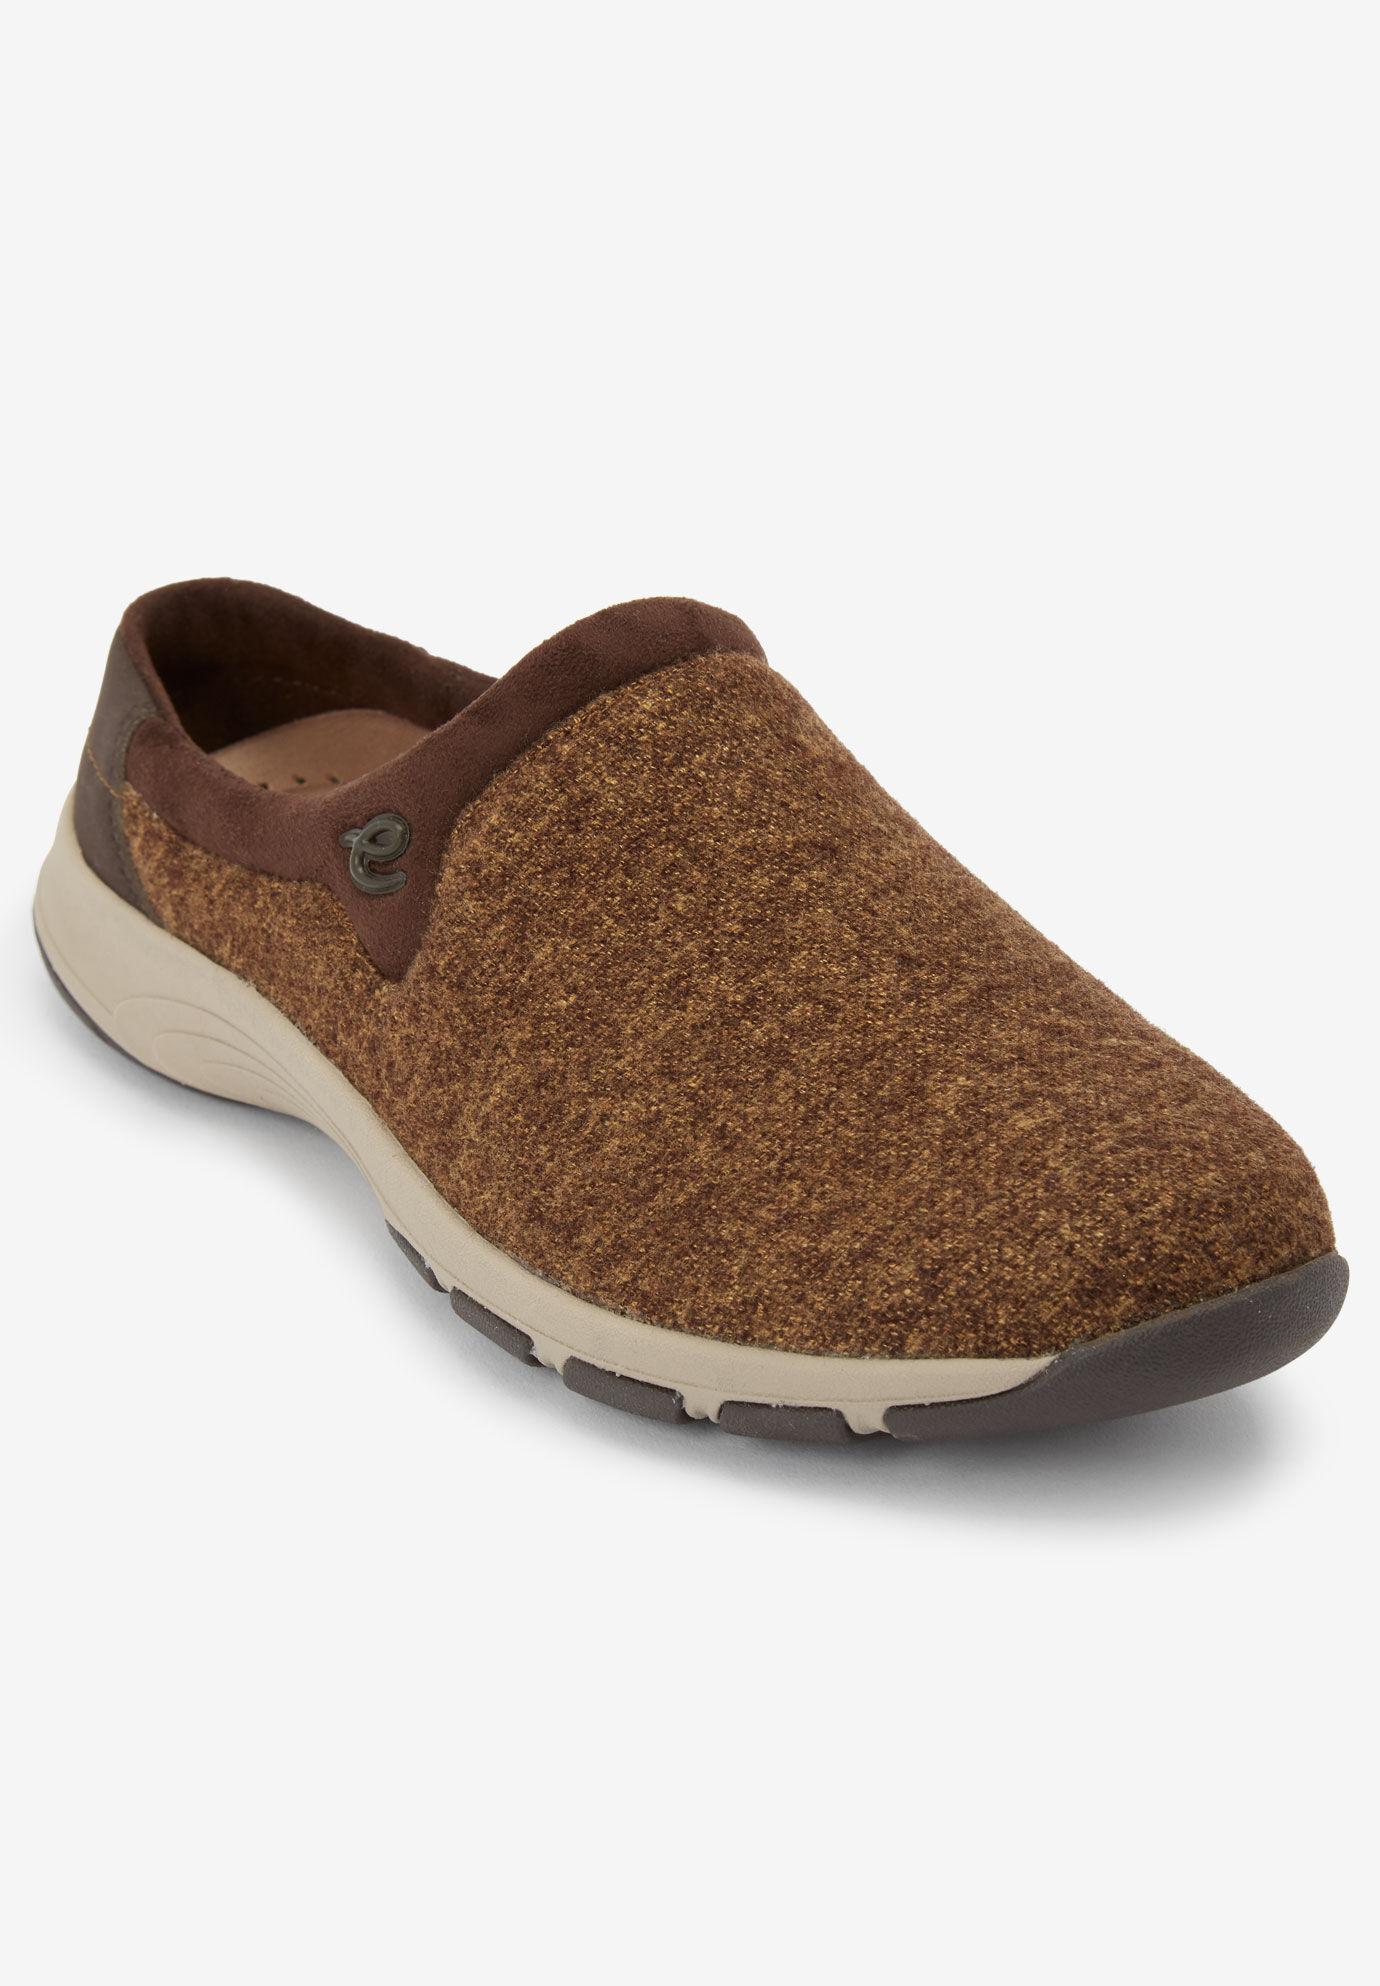 The Cedar Slip-On Mule by Easy Spirit